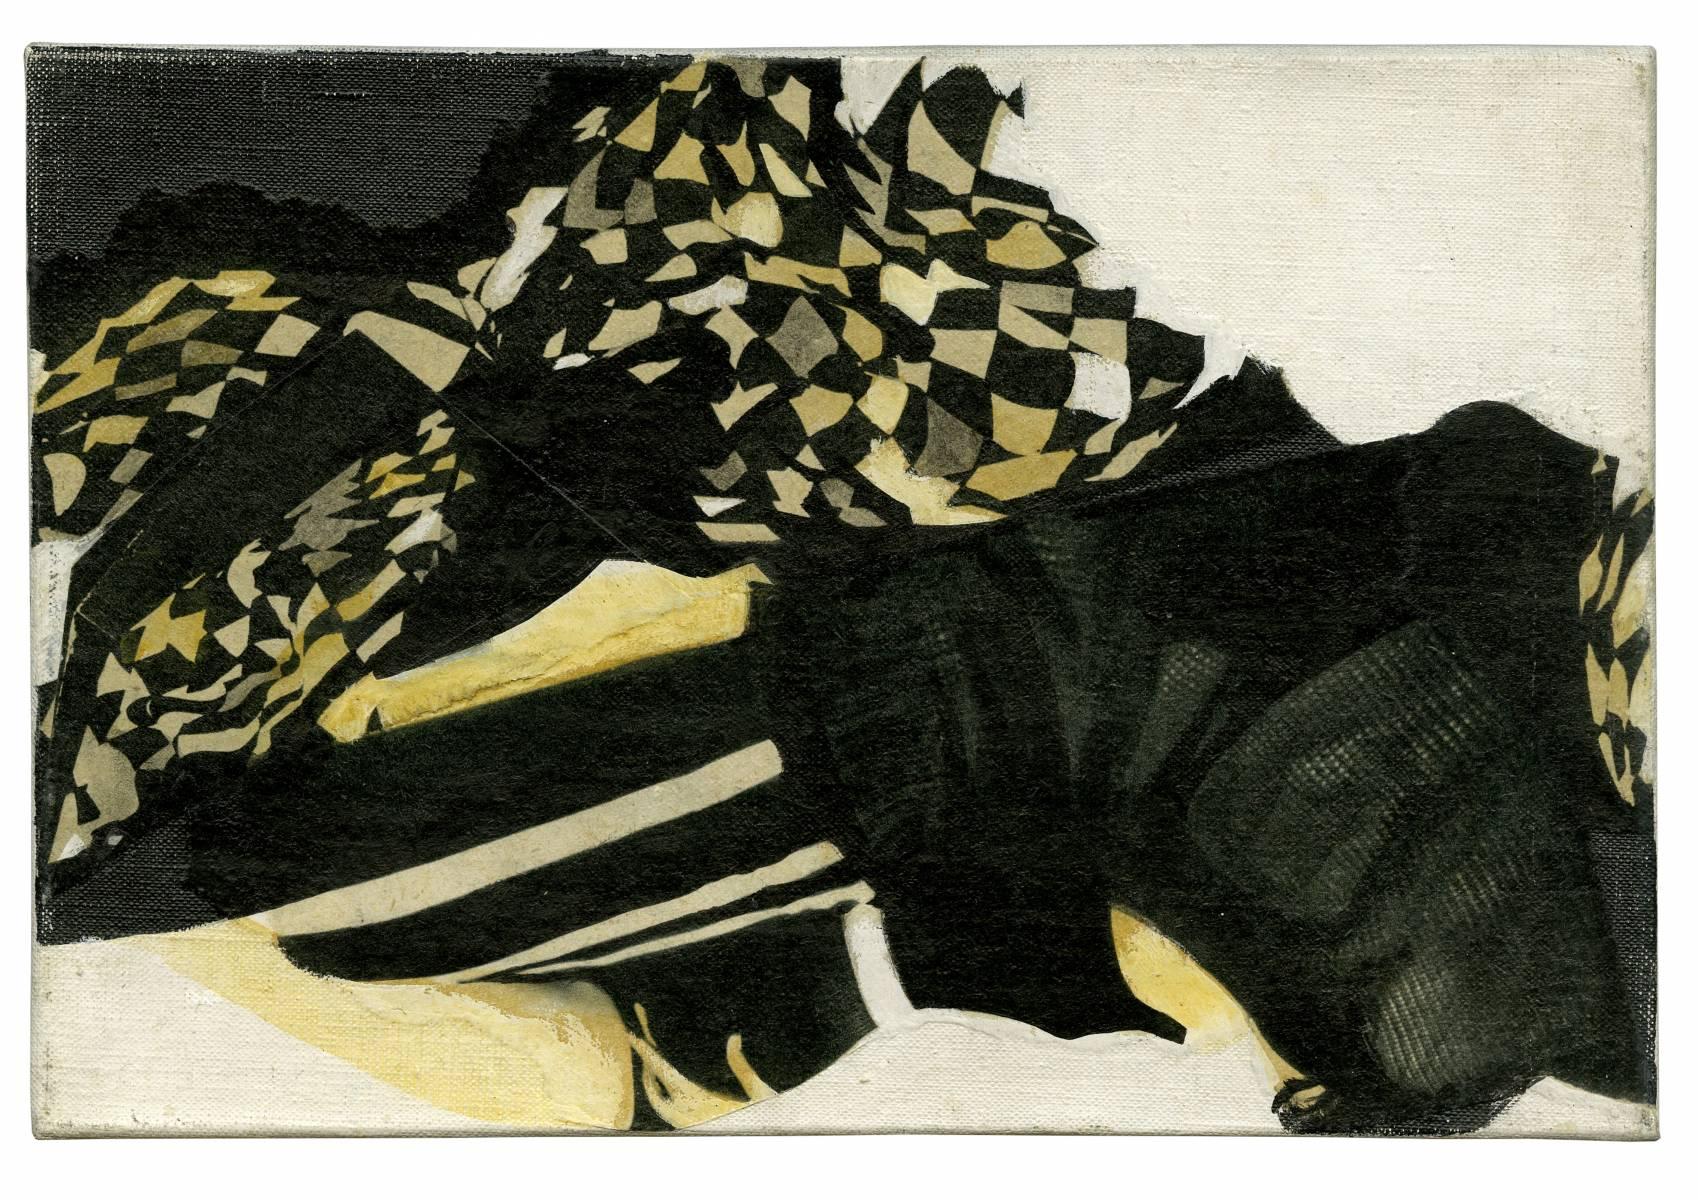 Sin título (Serie Essai sur une Psychologie Collective ) (1965) - Joan Rabascall